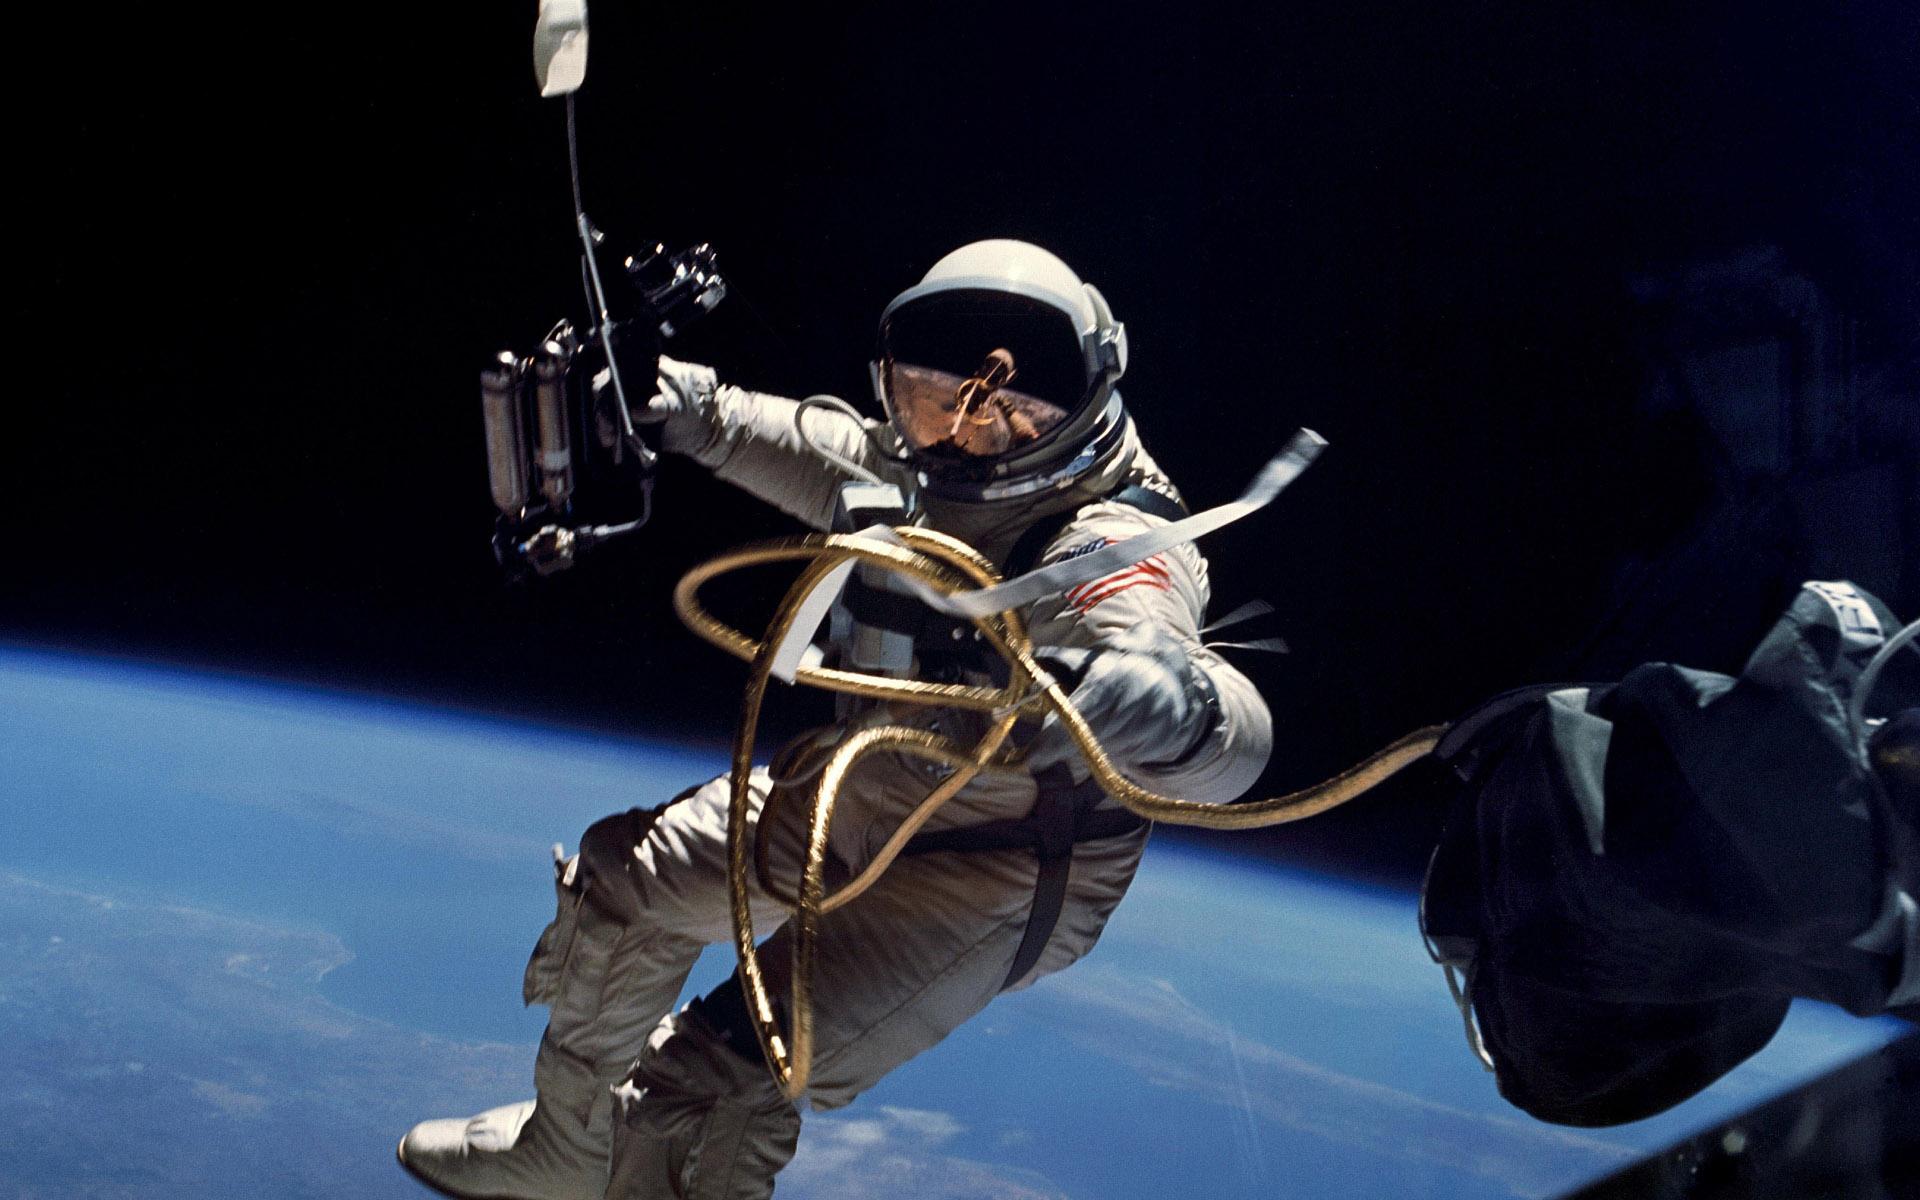 NASA Wallpaper Images Download HD Wallpapers 1920x1200